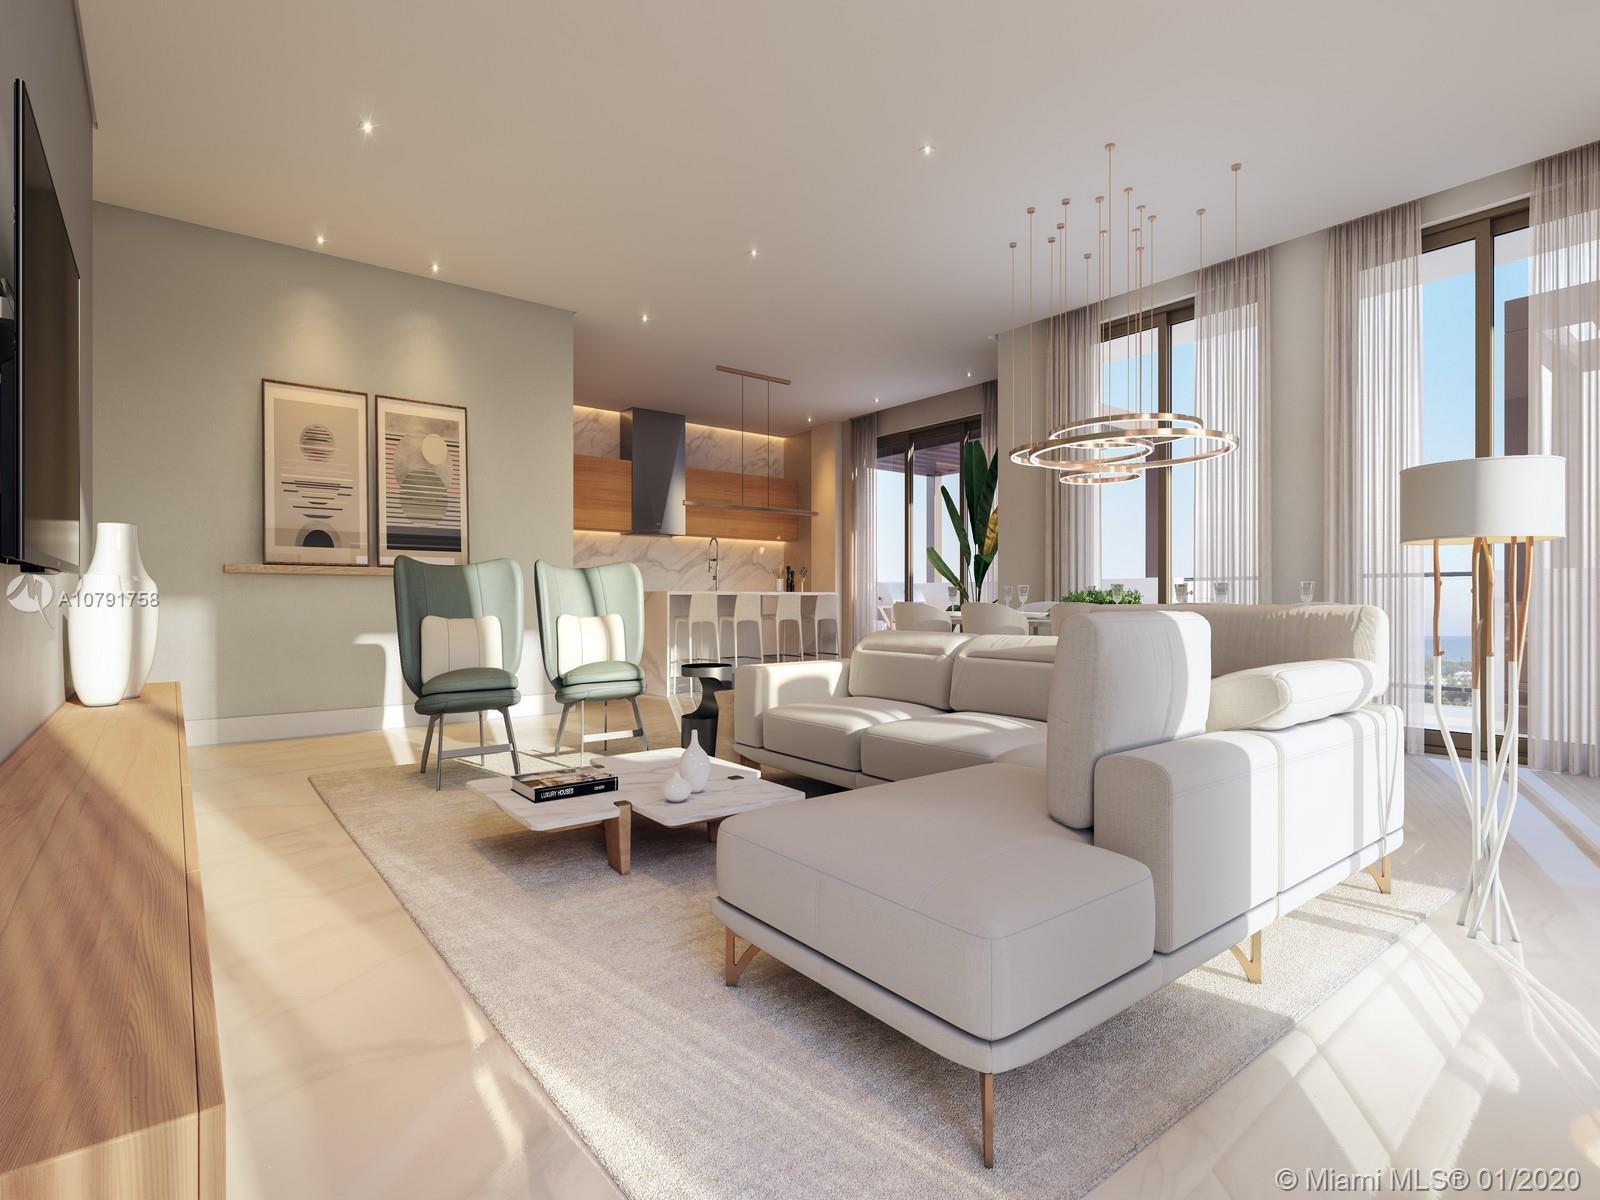 475 E Royal Palm Rd #304, Boca Raton, FL 33432 - Boca Raton, FL real estate listing